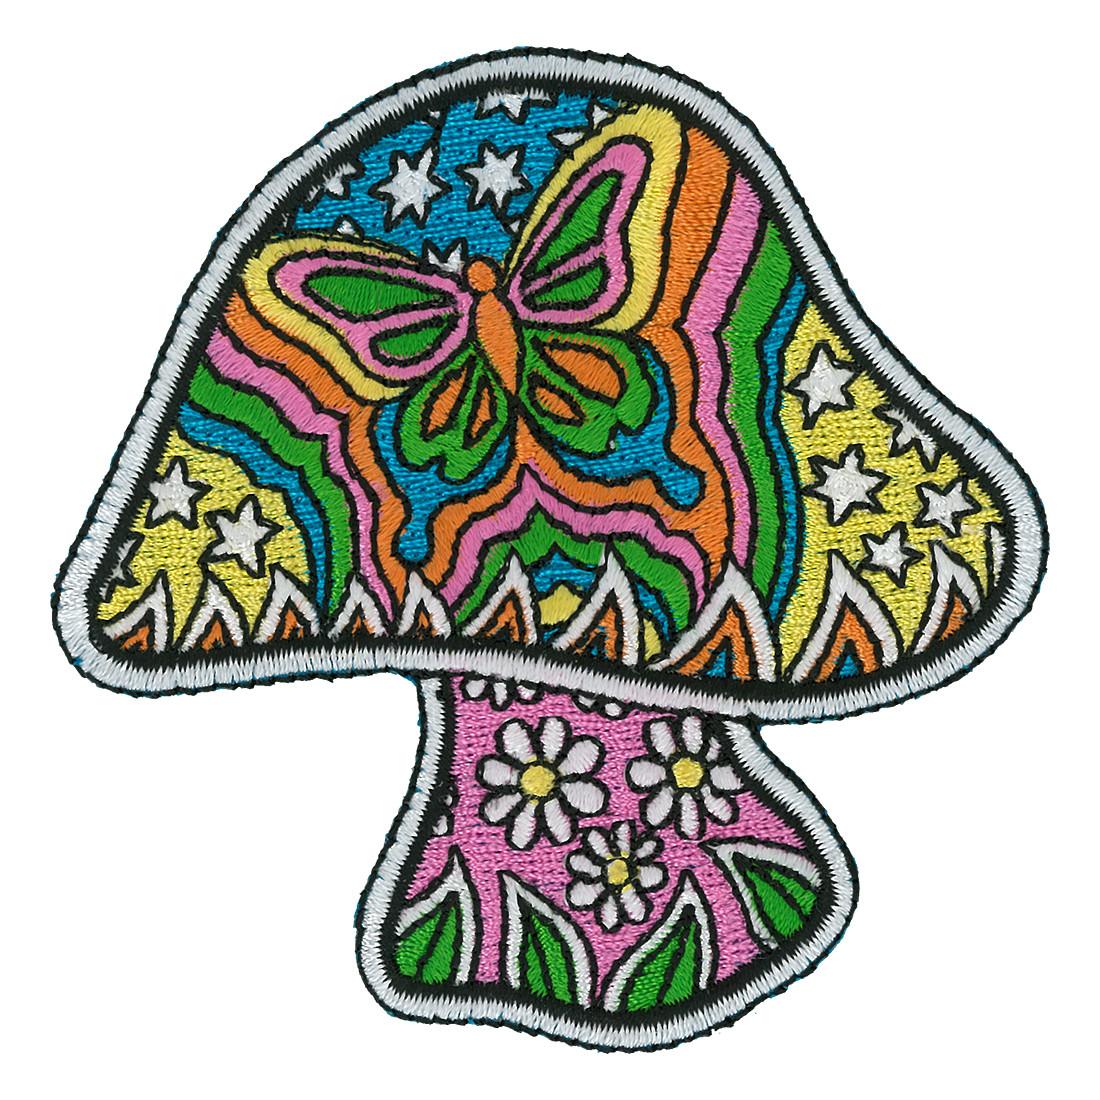 Butterfly Mushroom Patch